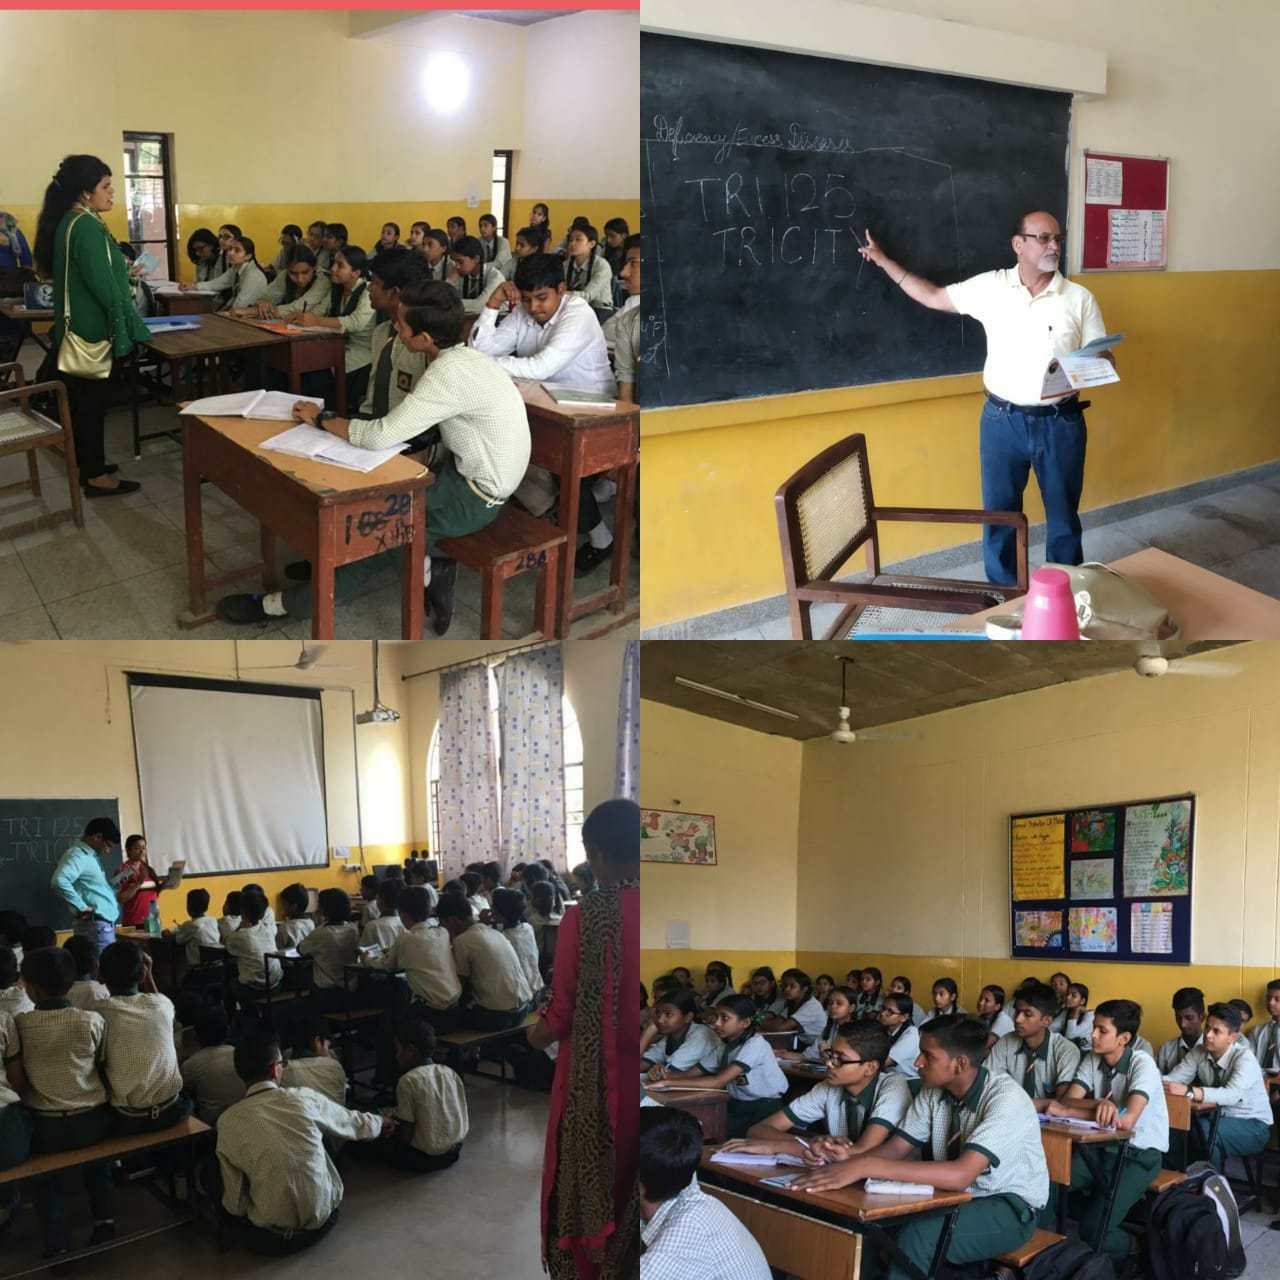 Govt model sanskriti Sr sec school Pkl & DAV sr sec school-8 Panchkula.jpeg